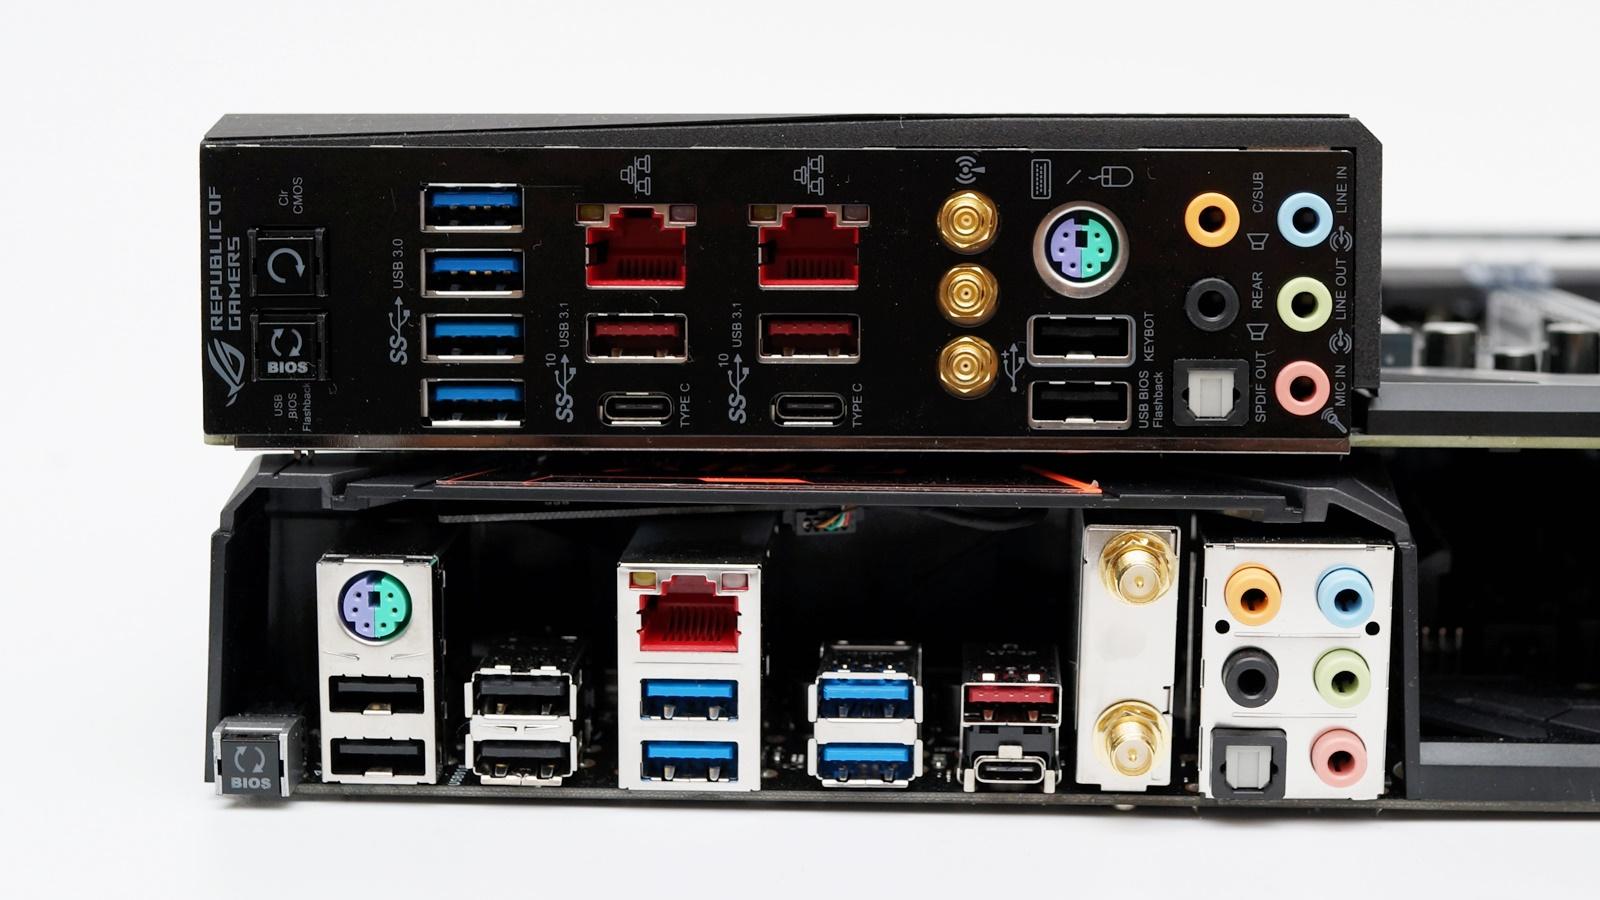 Xf 10asus Rog Rampage V Edition 10 Asus Motherboard 10strix X99 Gaming Io